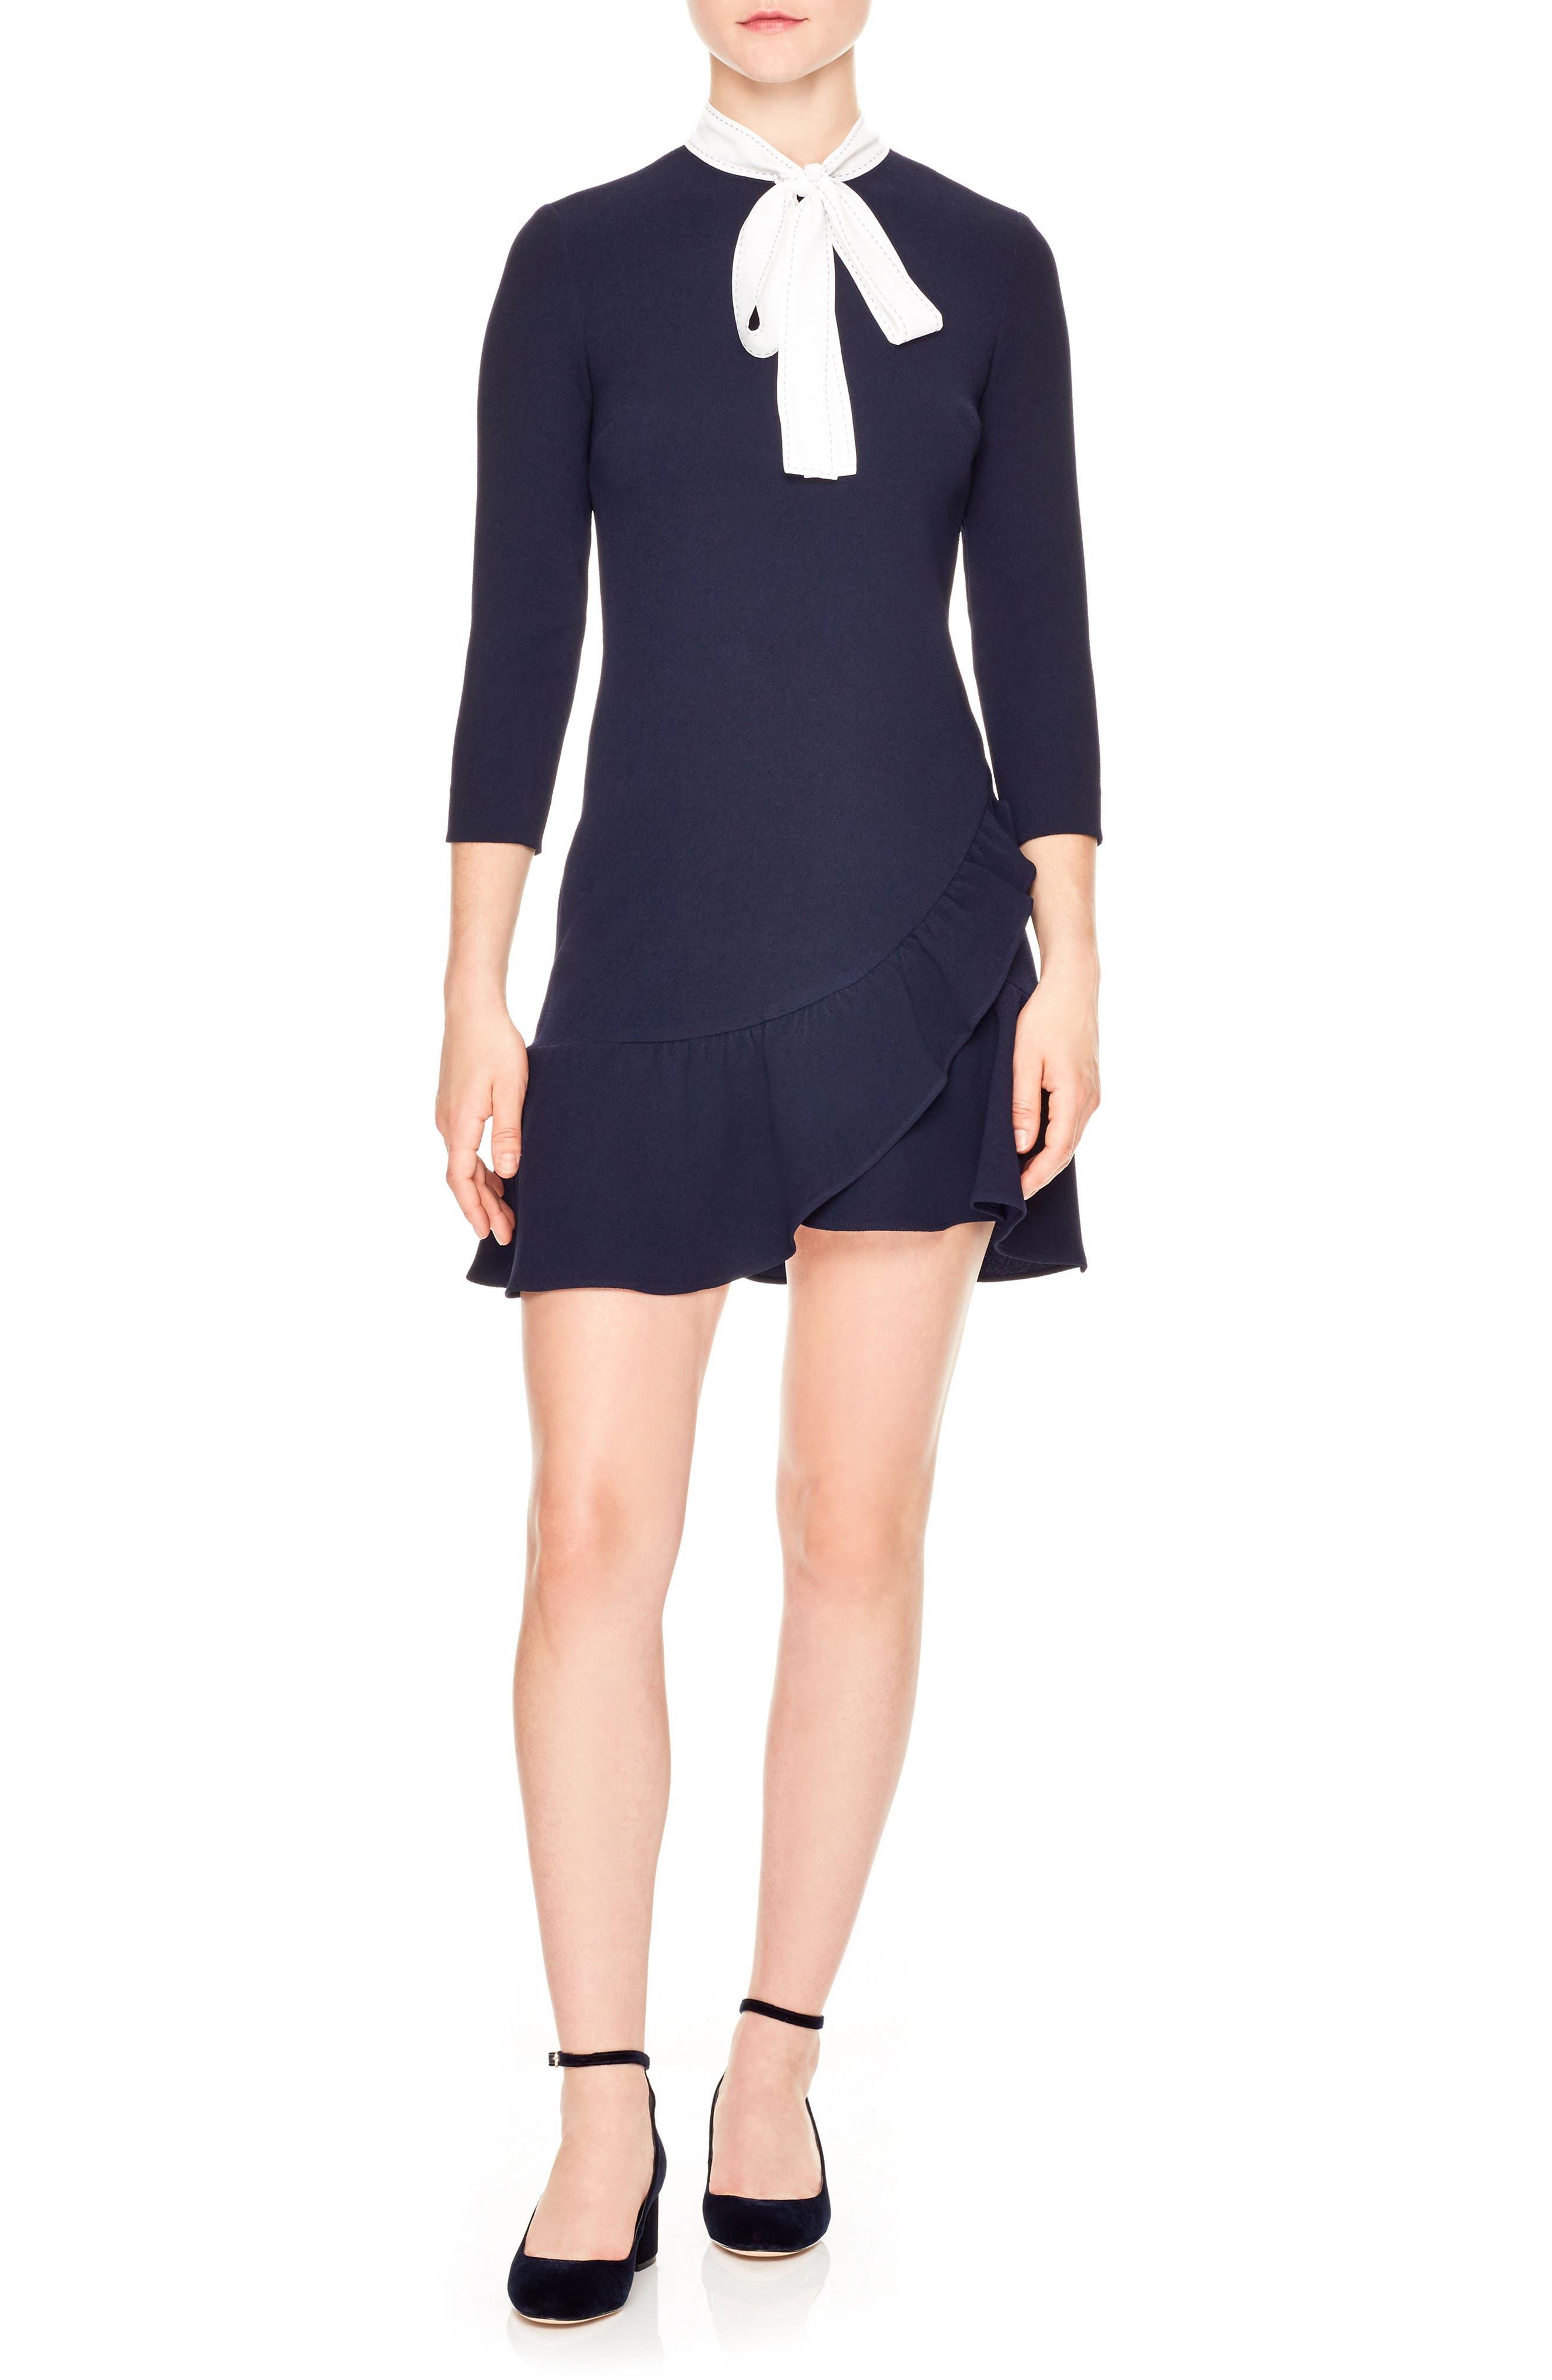 Ghalia Tie Neck Dress,                         Main,                         color, 401